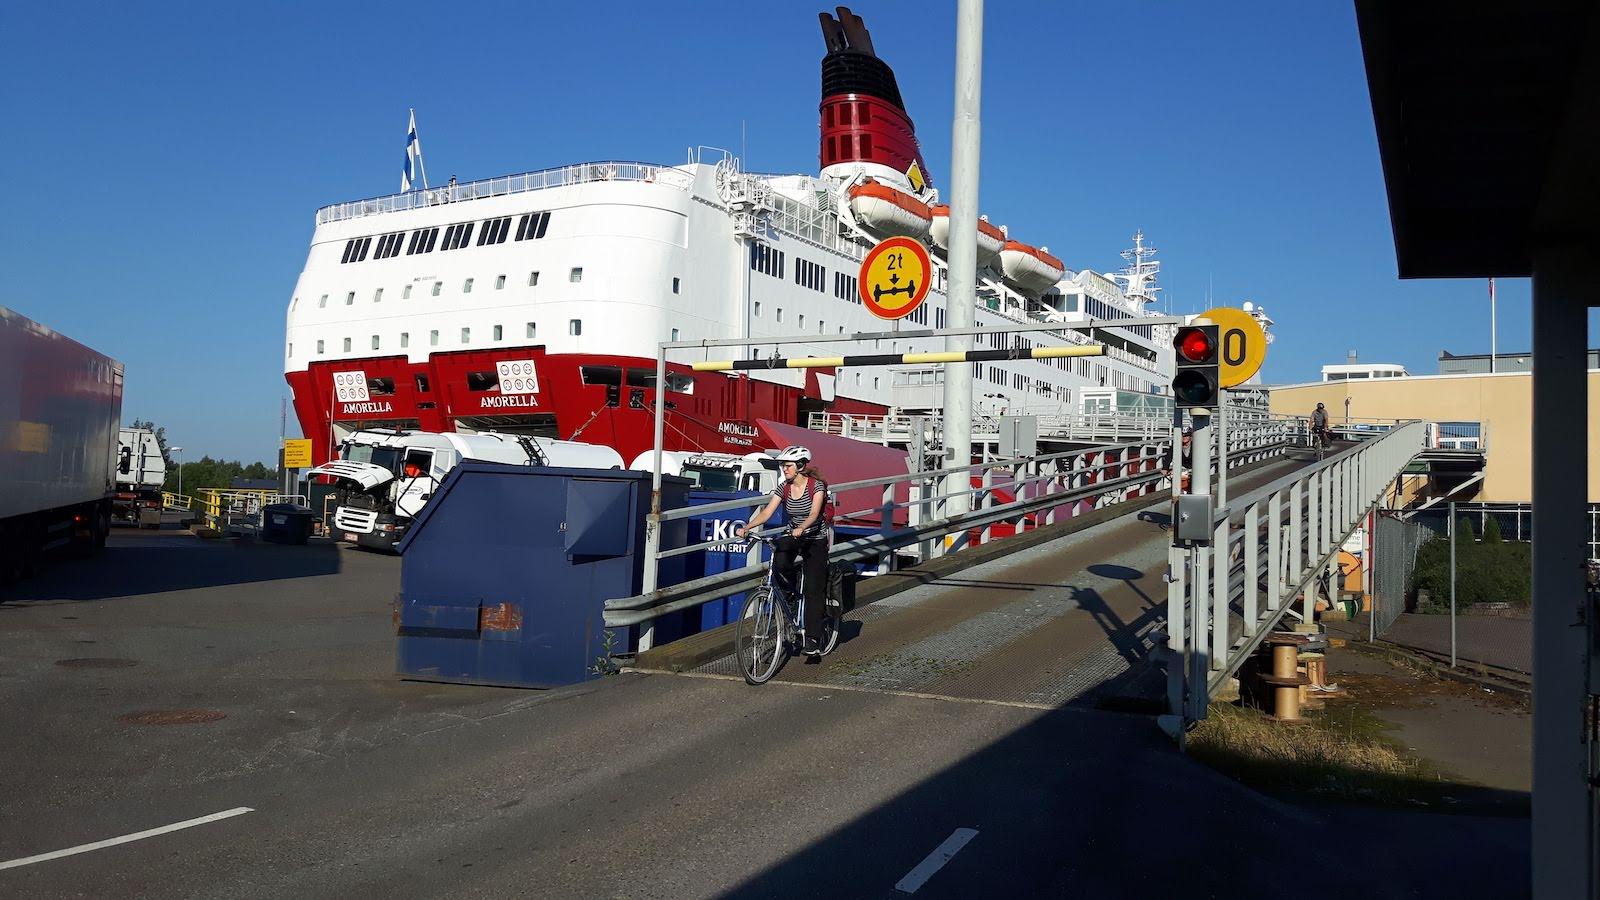 Leavining Turku for Sweden on a ferry